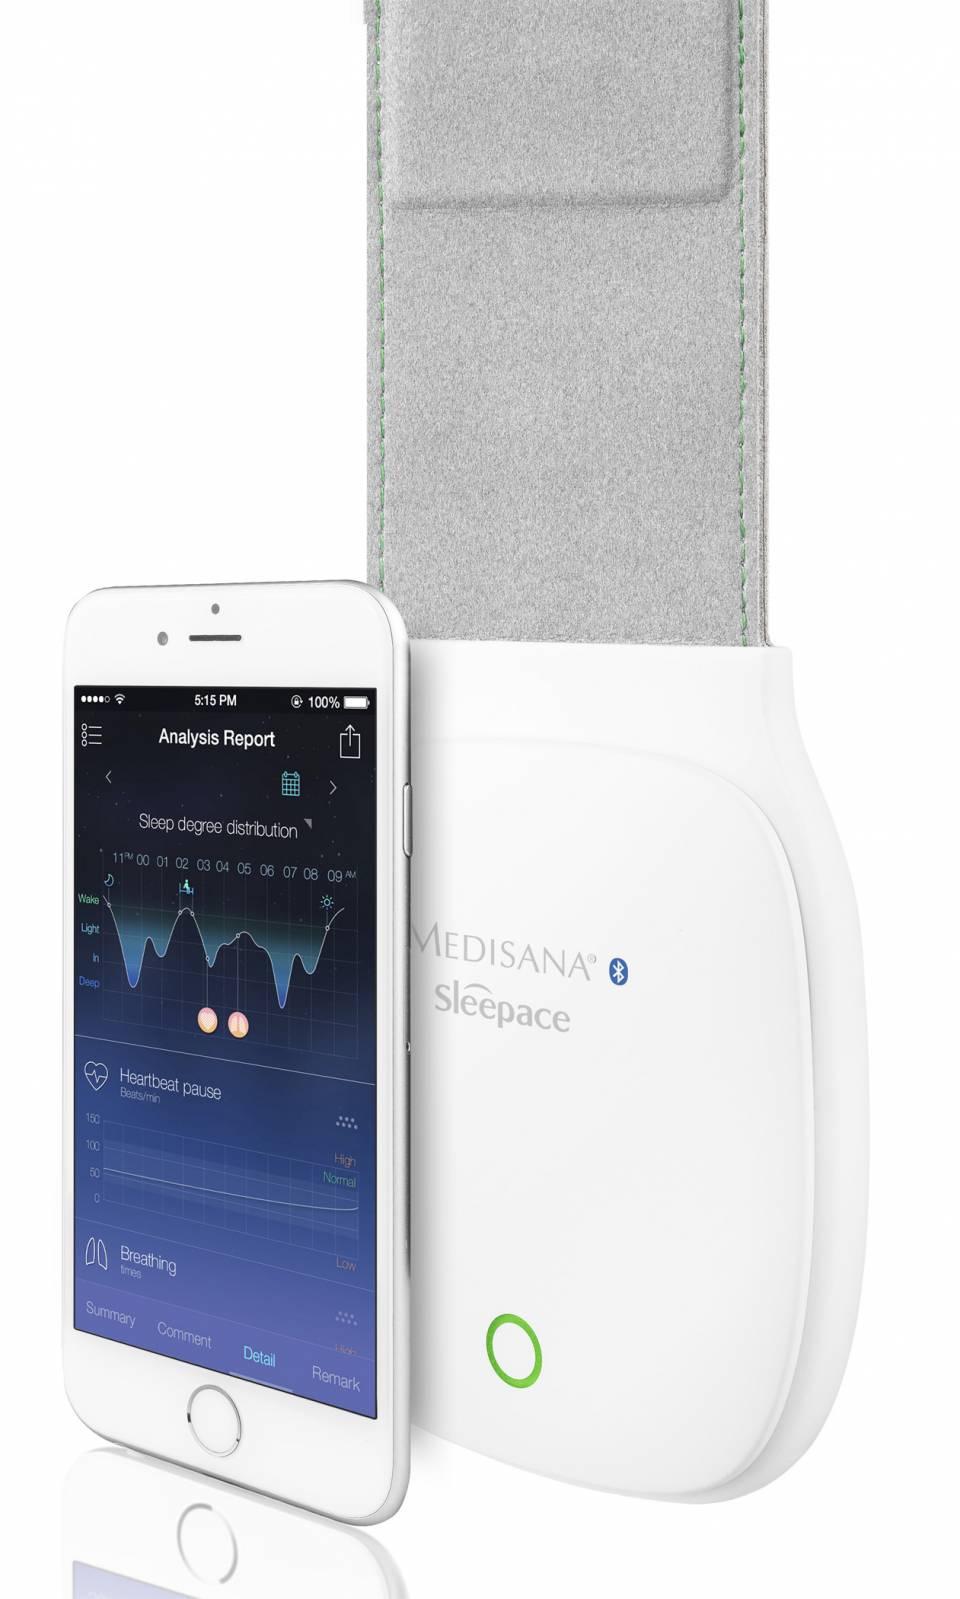 Medisana Schlafmonitor Sleepace mit Sleepace App.